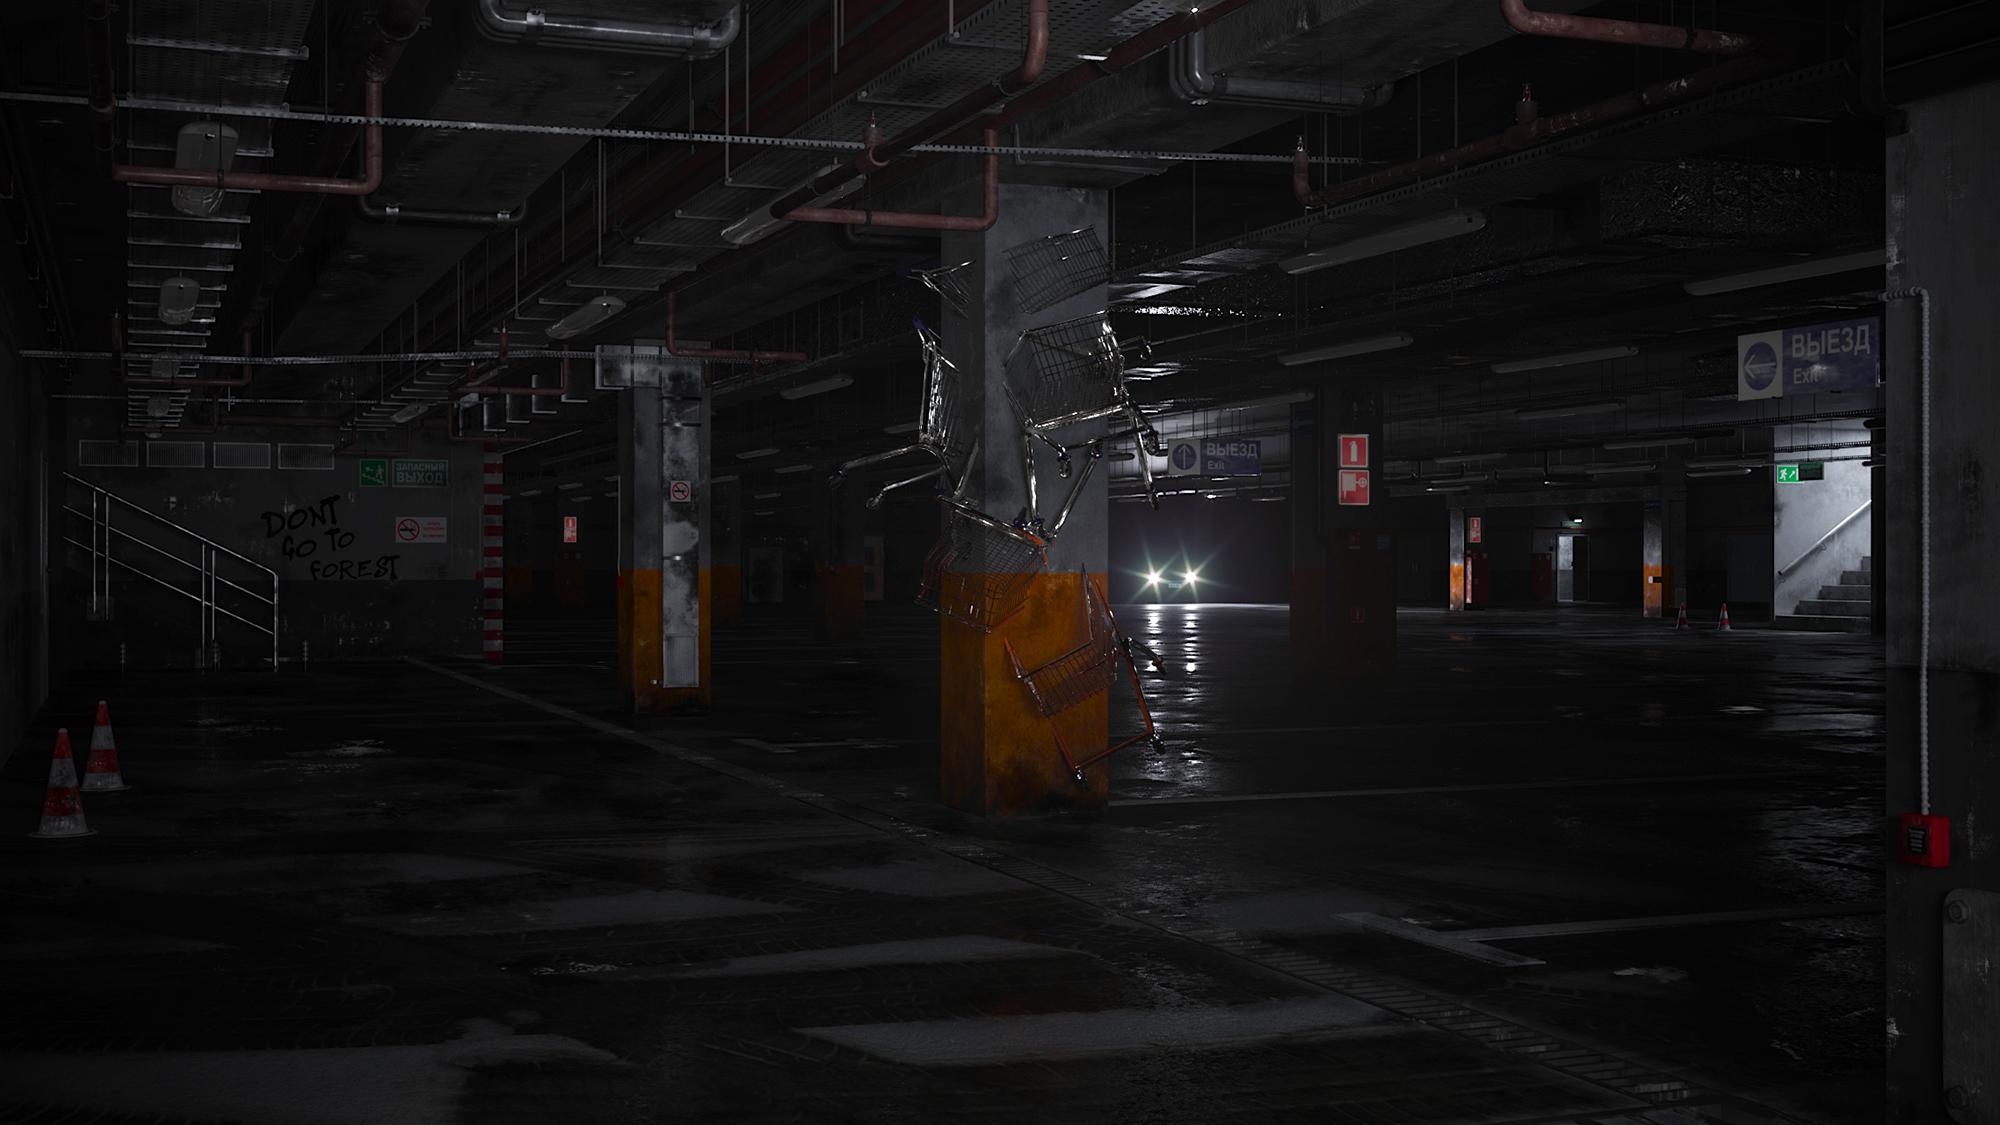 случай на парковке II.jpg